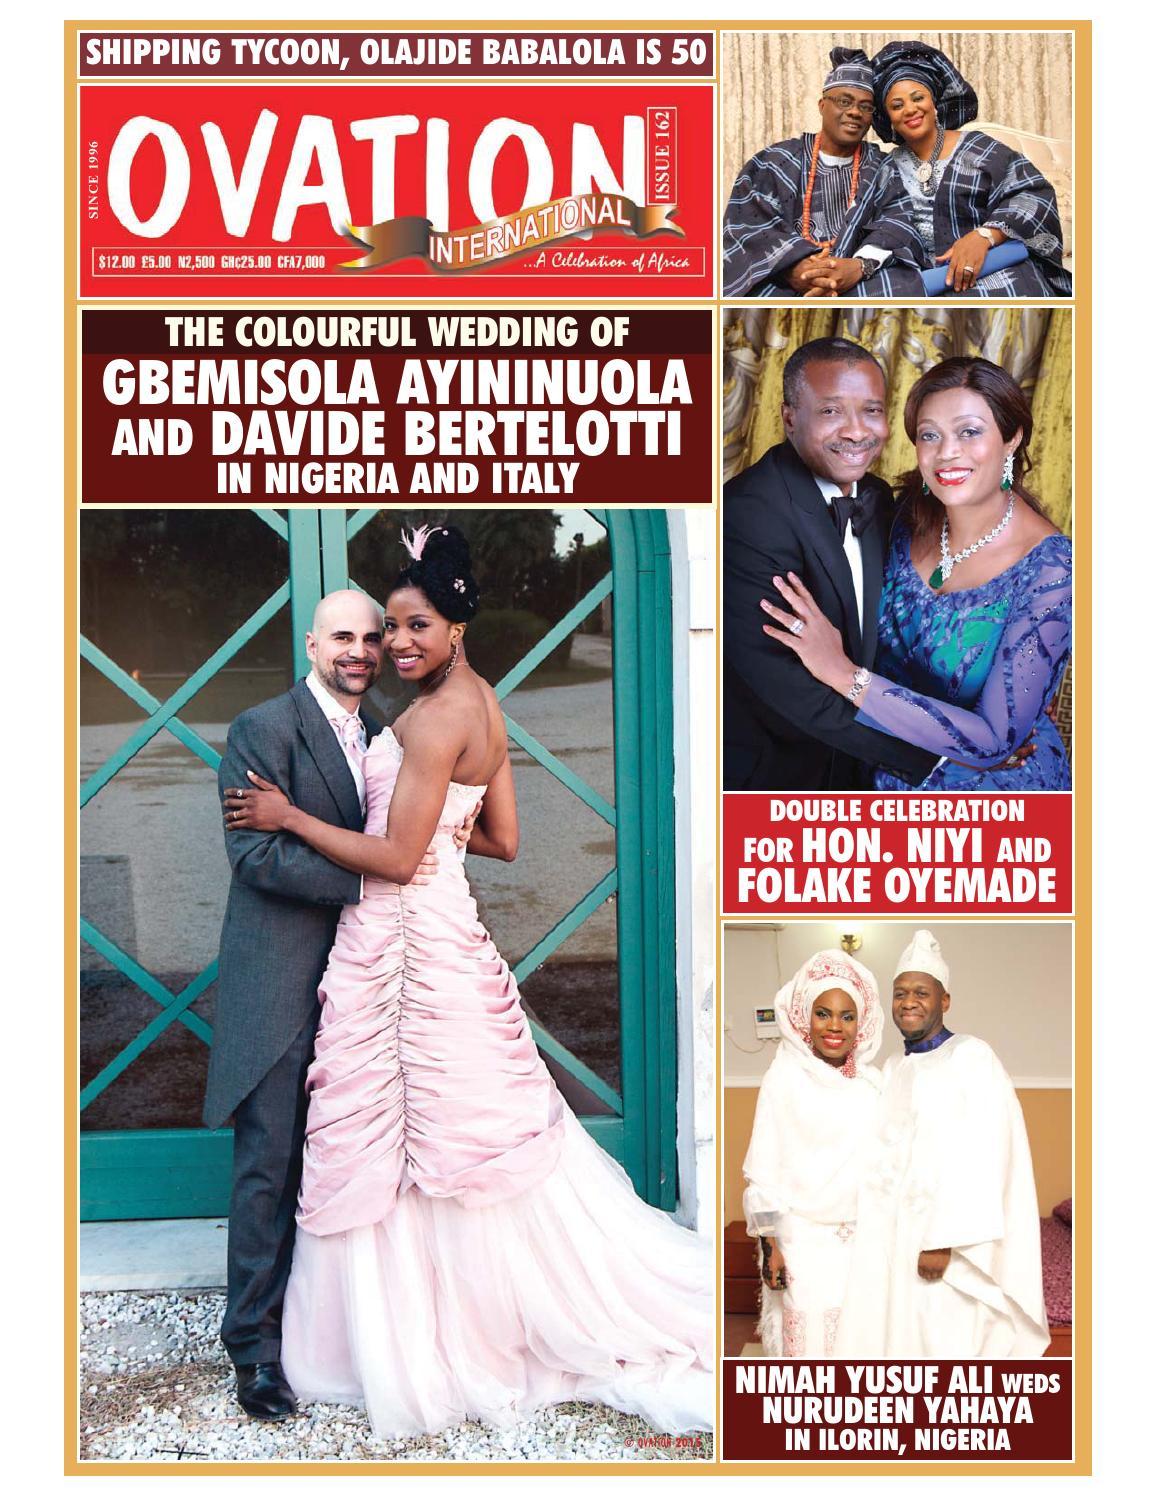 Ovation magazine issue 162 by t2eOvation - issuu